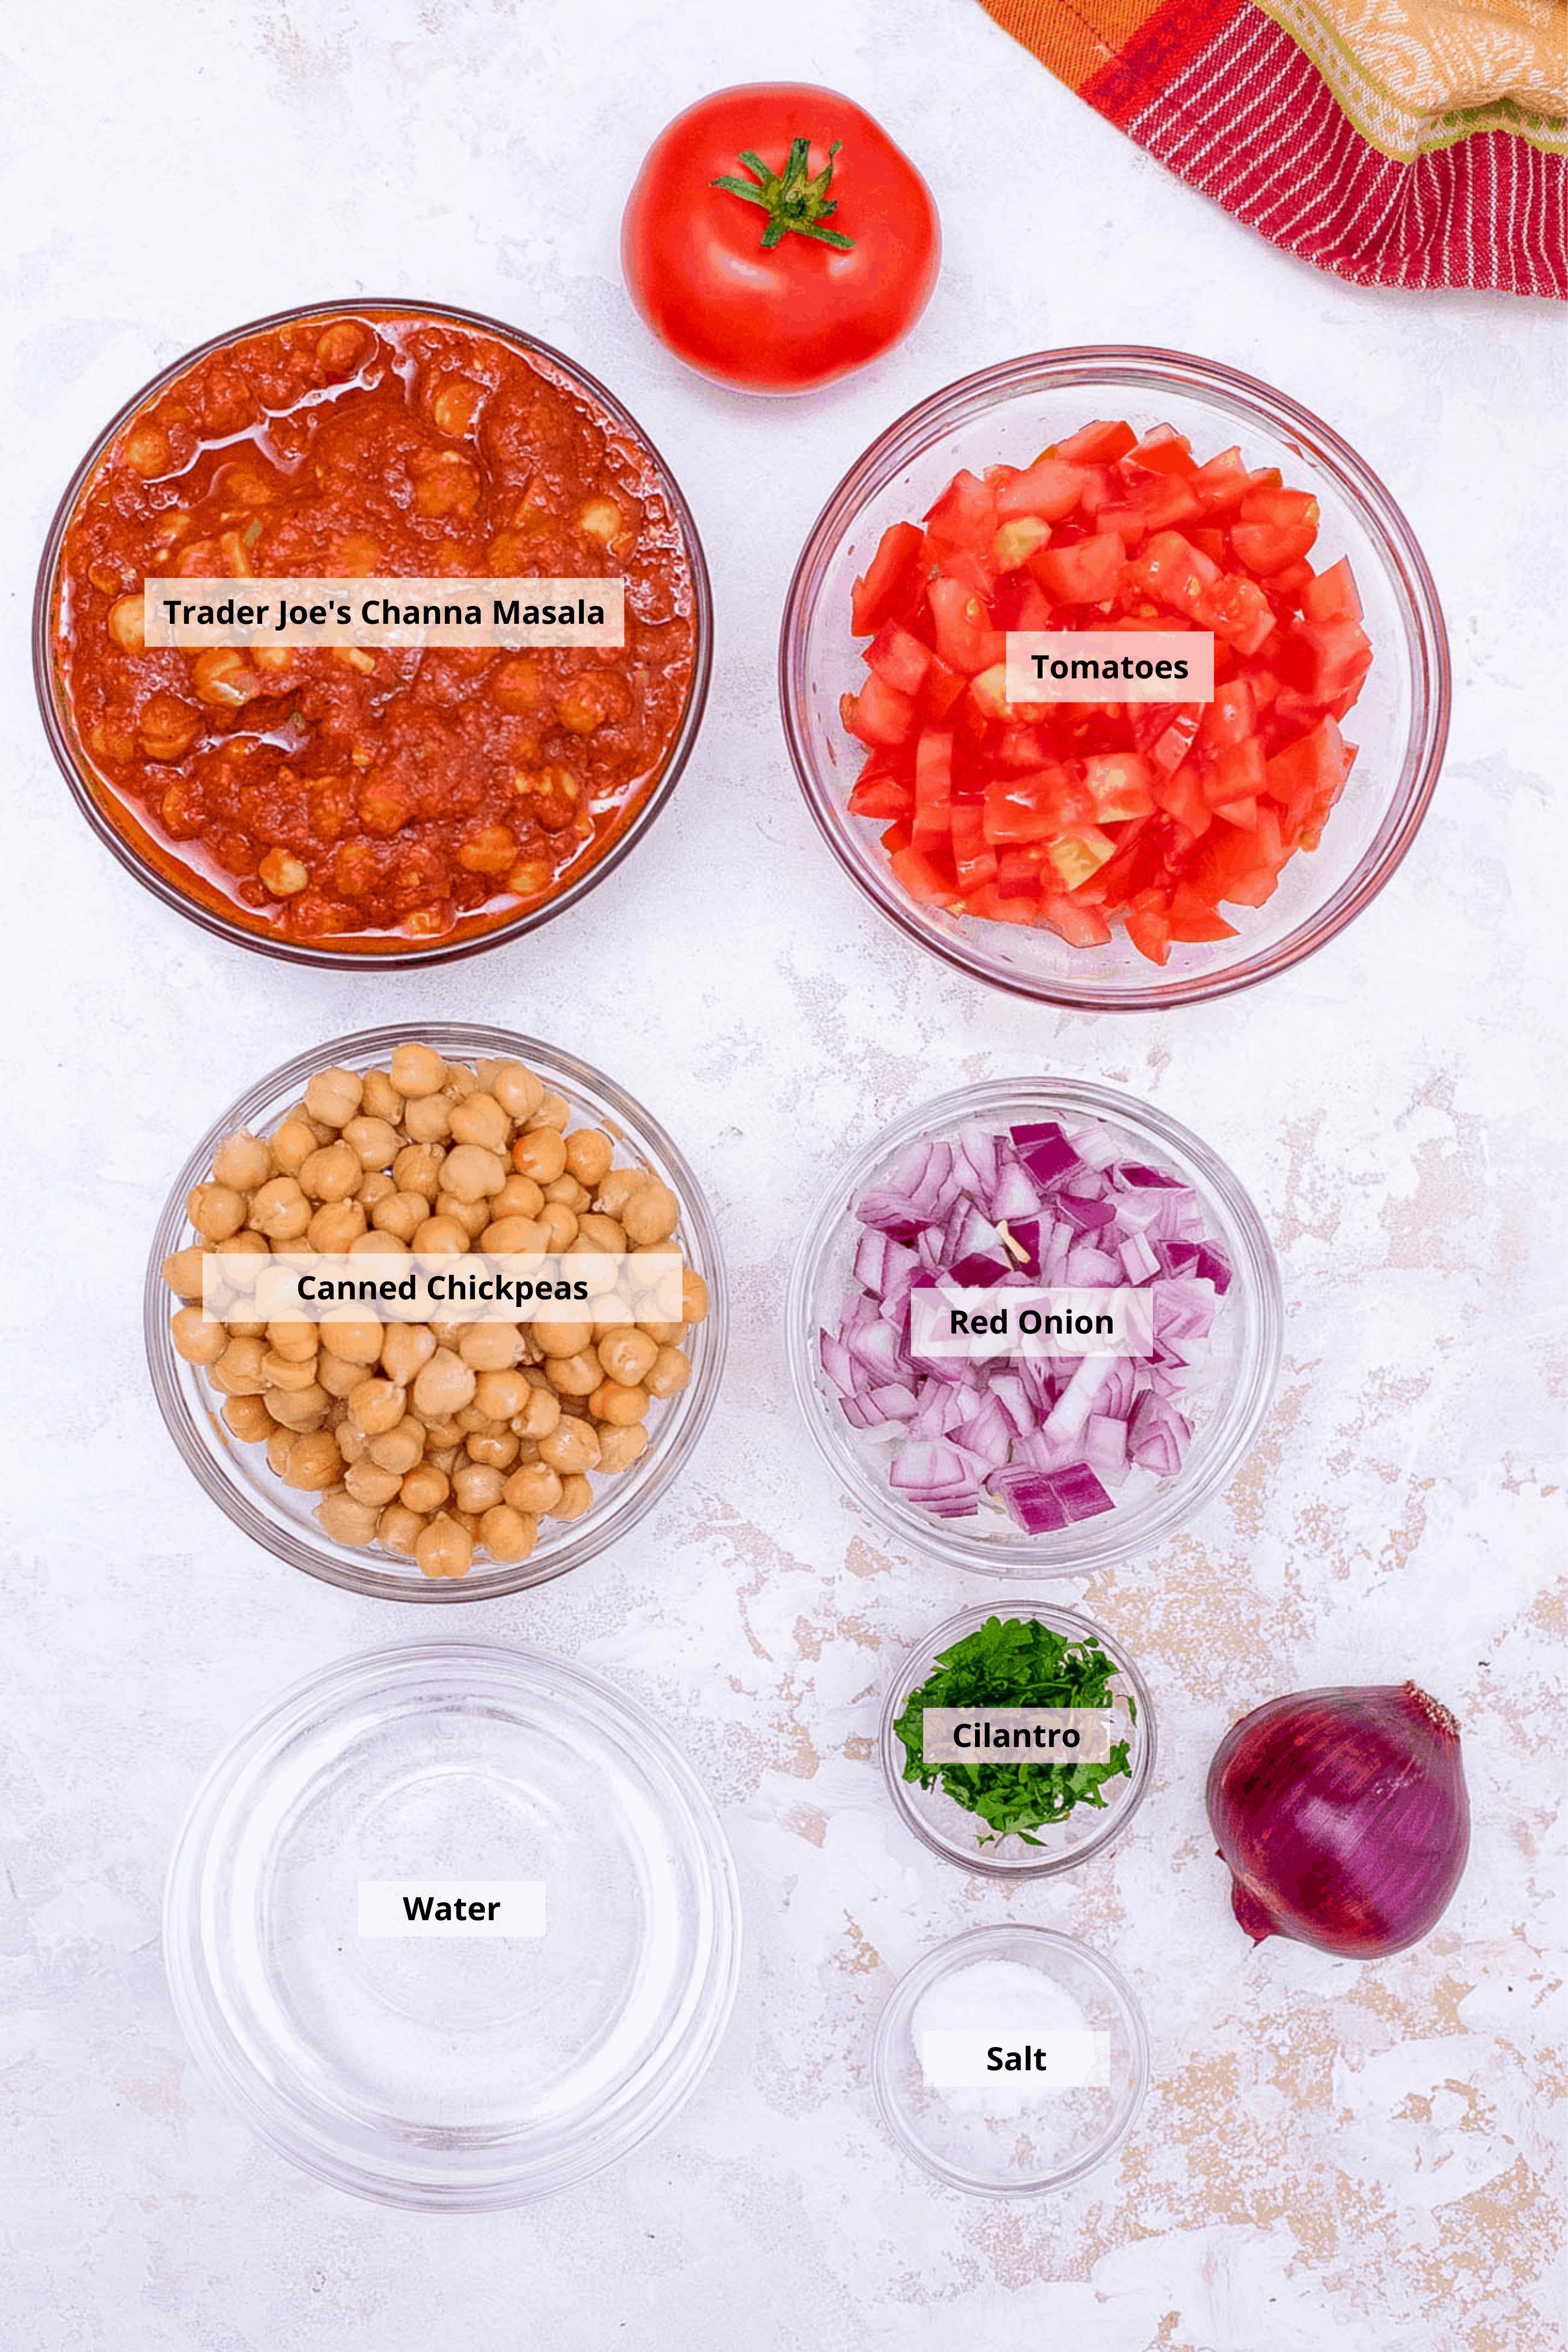 ingredients for trader joe's channa masala recipe